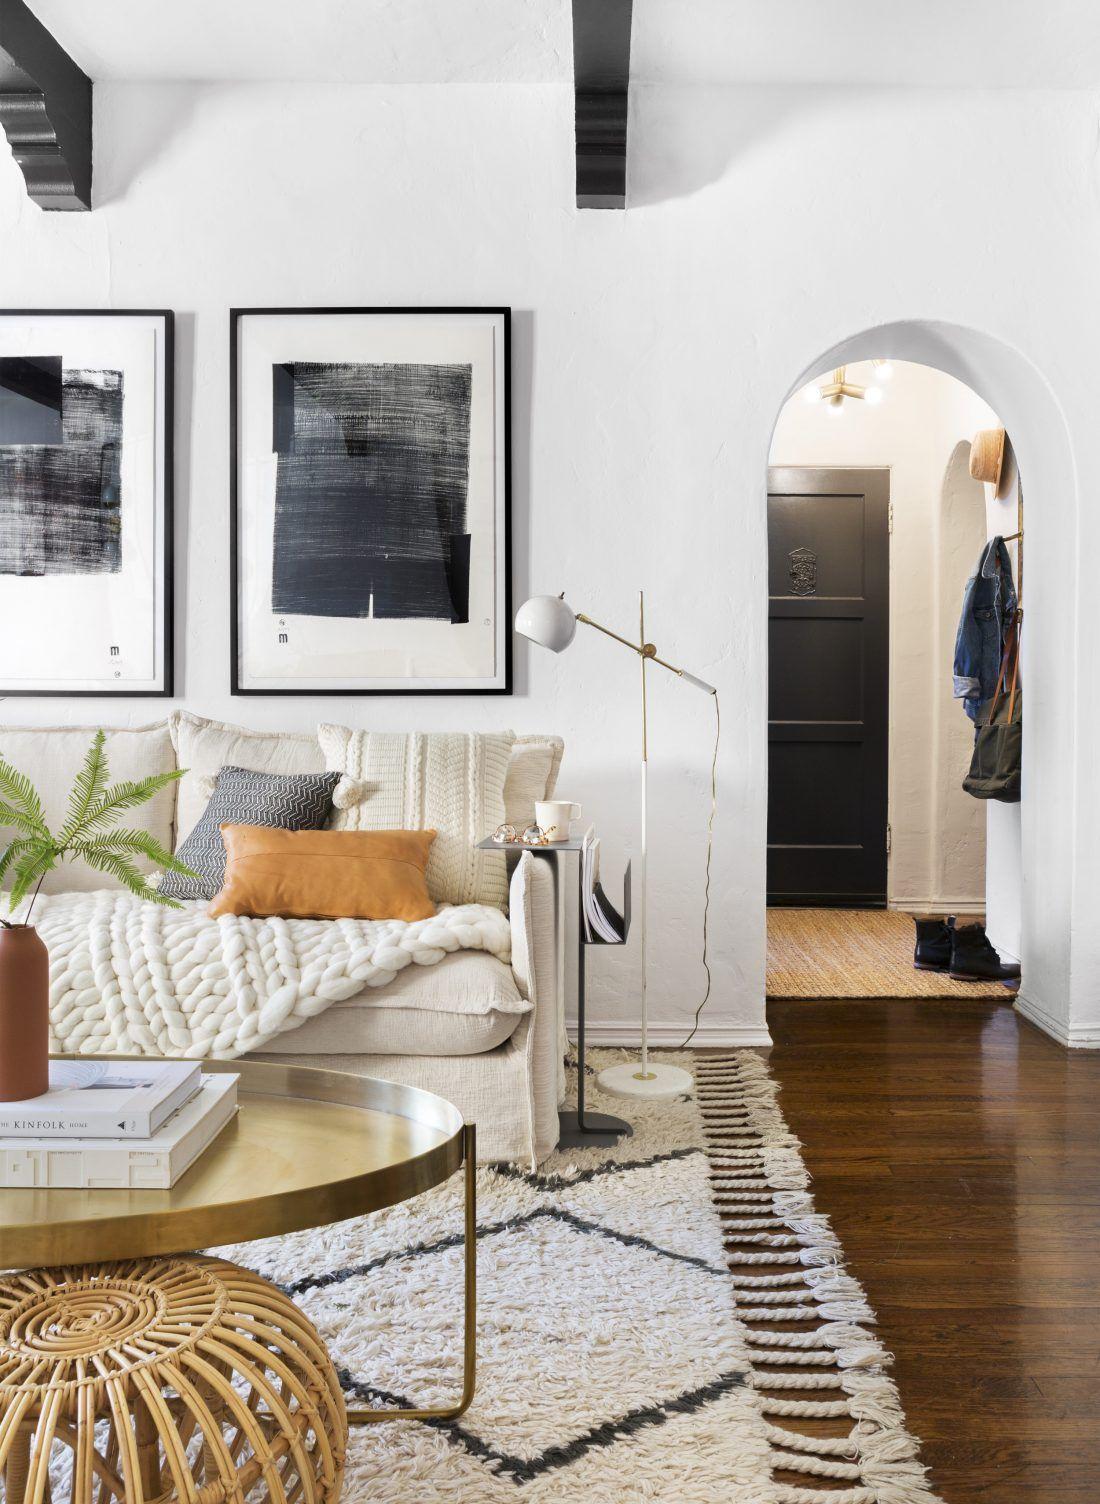 Daily Find Interior Design Home Decor Family Room Design